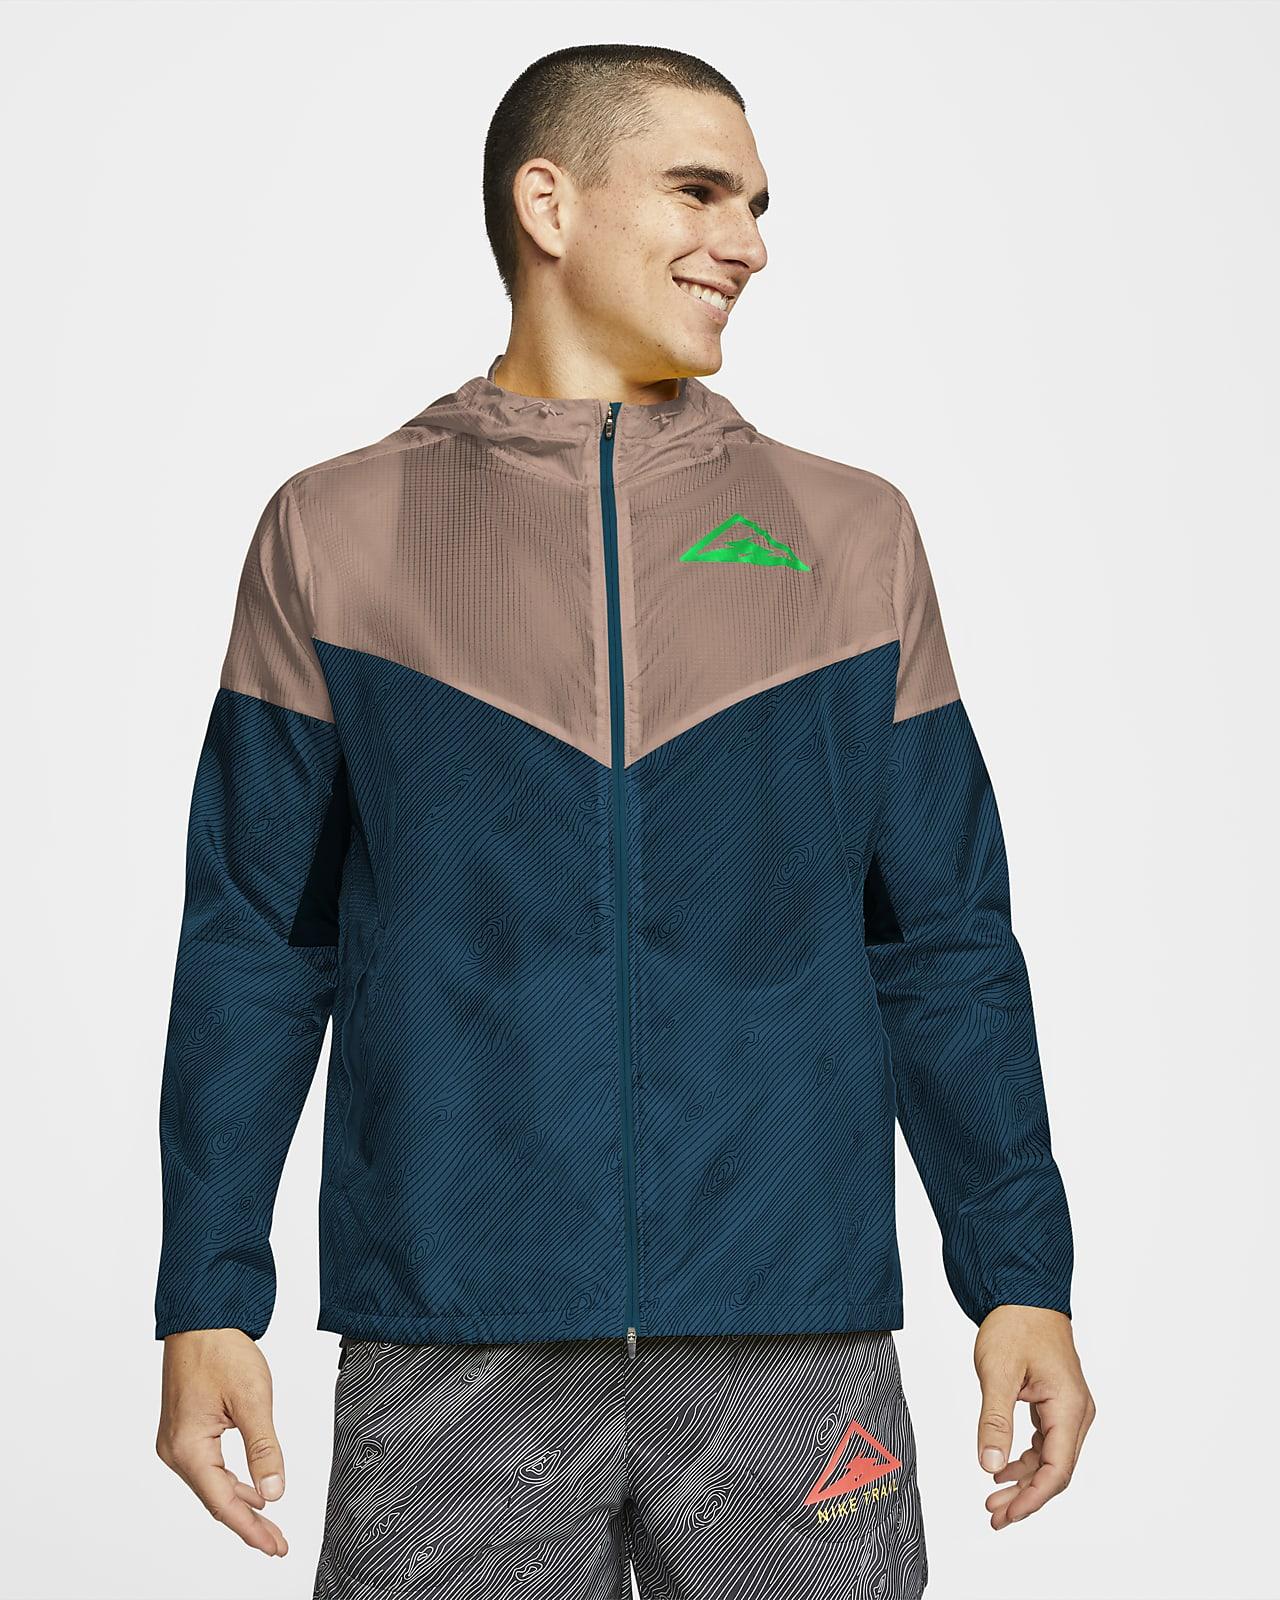 pensión Dialecto refugiados  Nike Windrunner Men's Hooded Trail Running Jacket. Nike SG